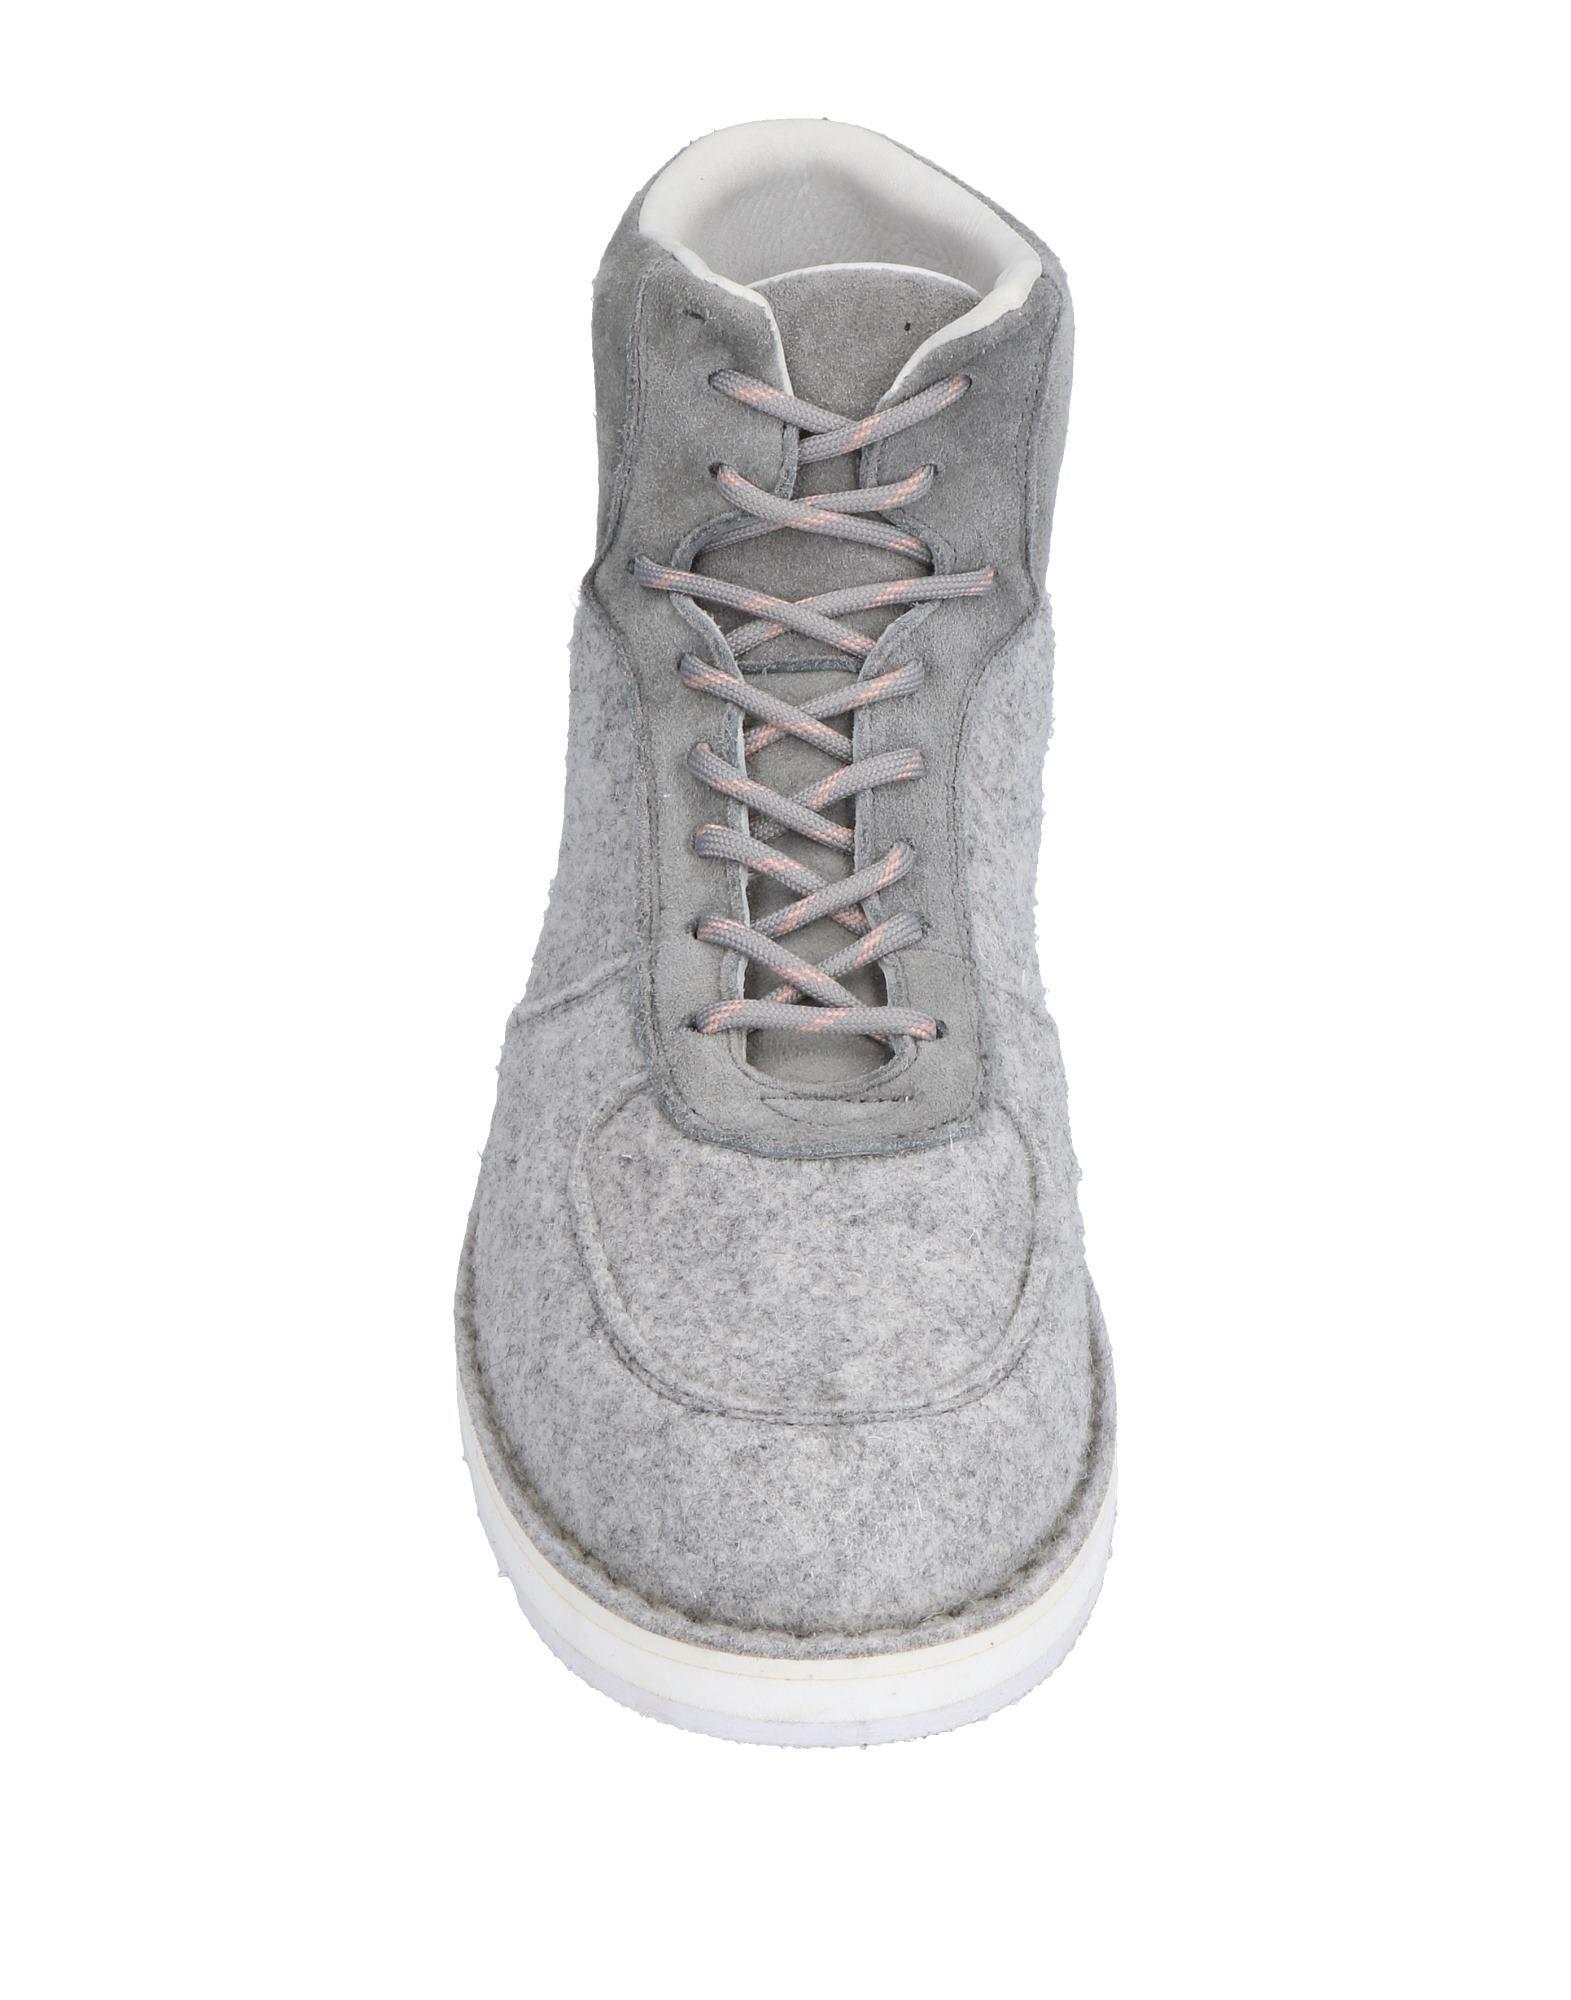 0796f99e22558 ... Diemme Herren Sneakers Herren Diemme 11507387AX Gute Qualität beliebte  Schuhe 919857 ...